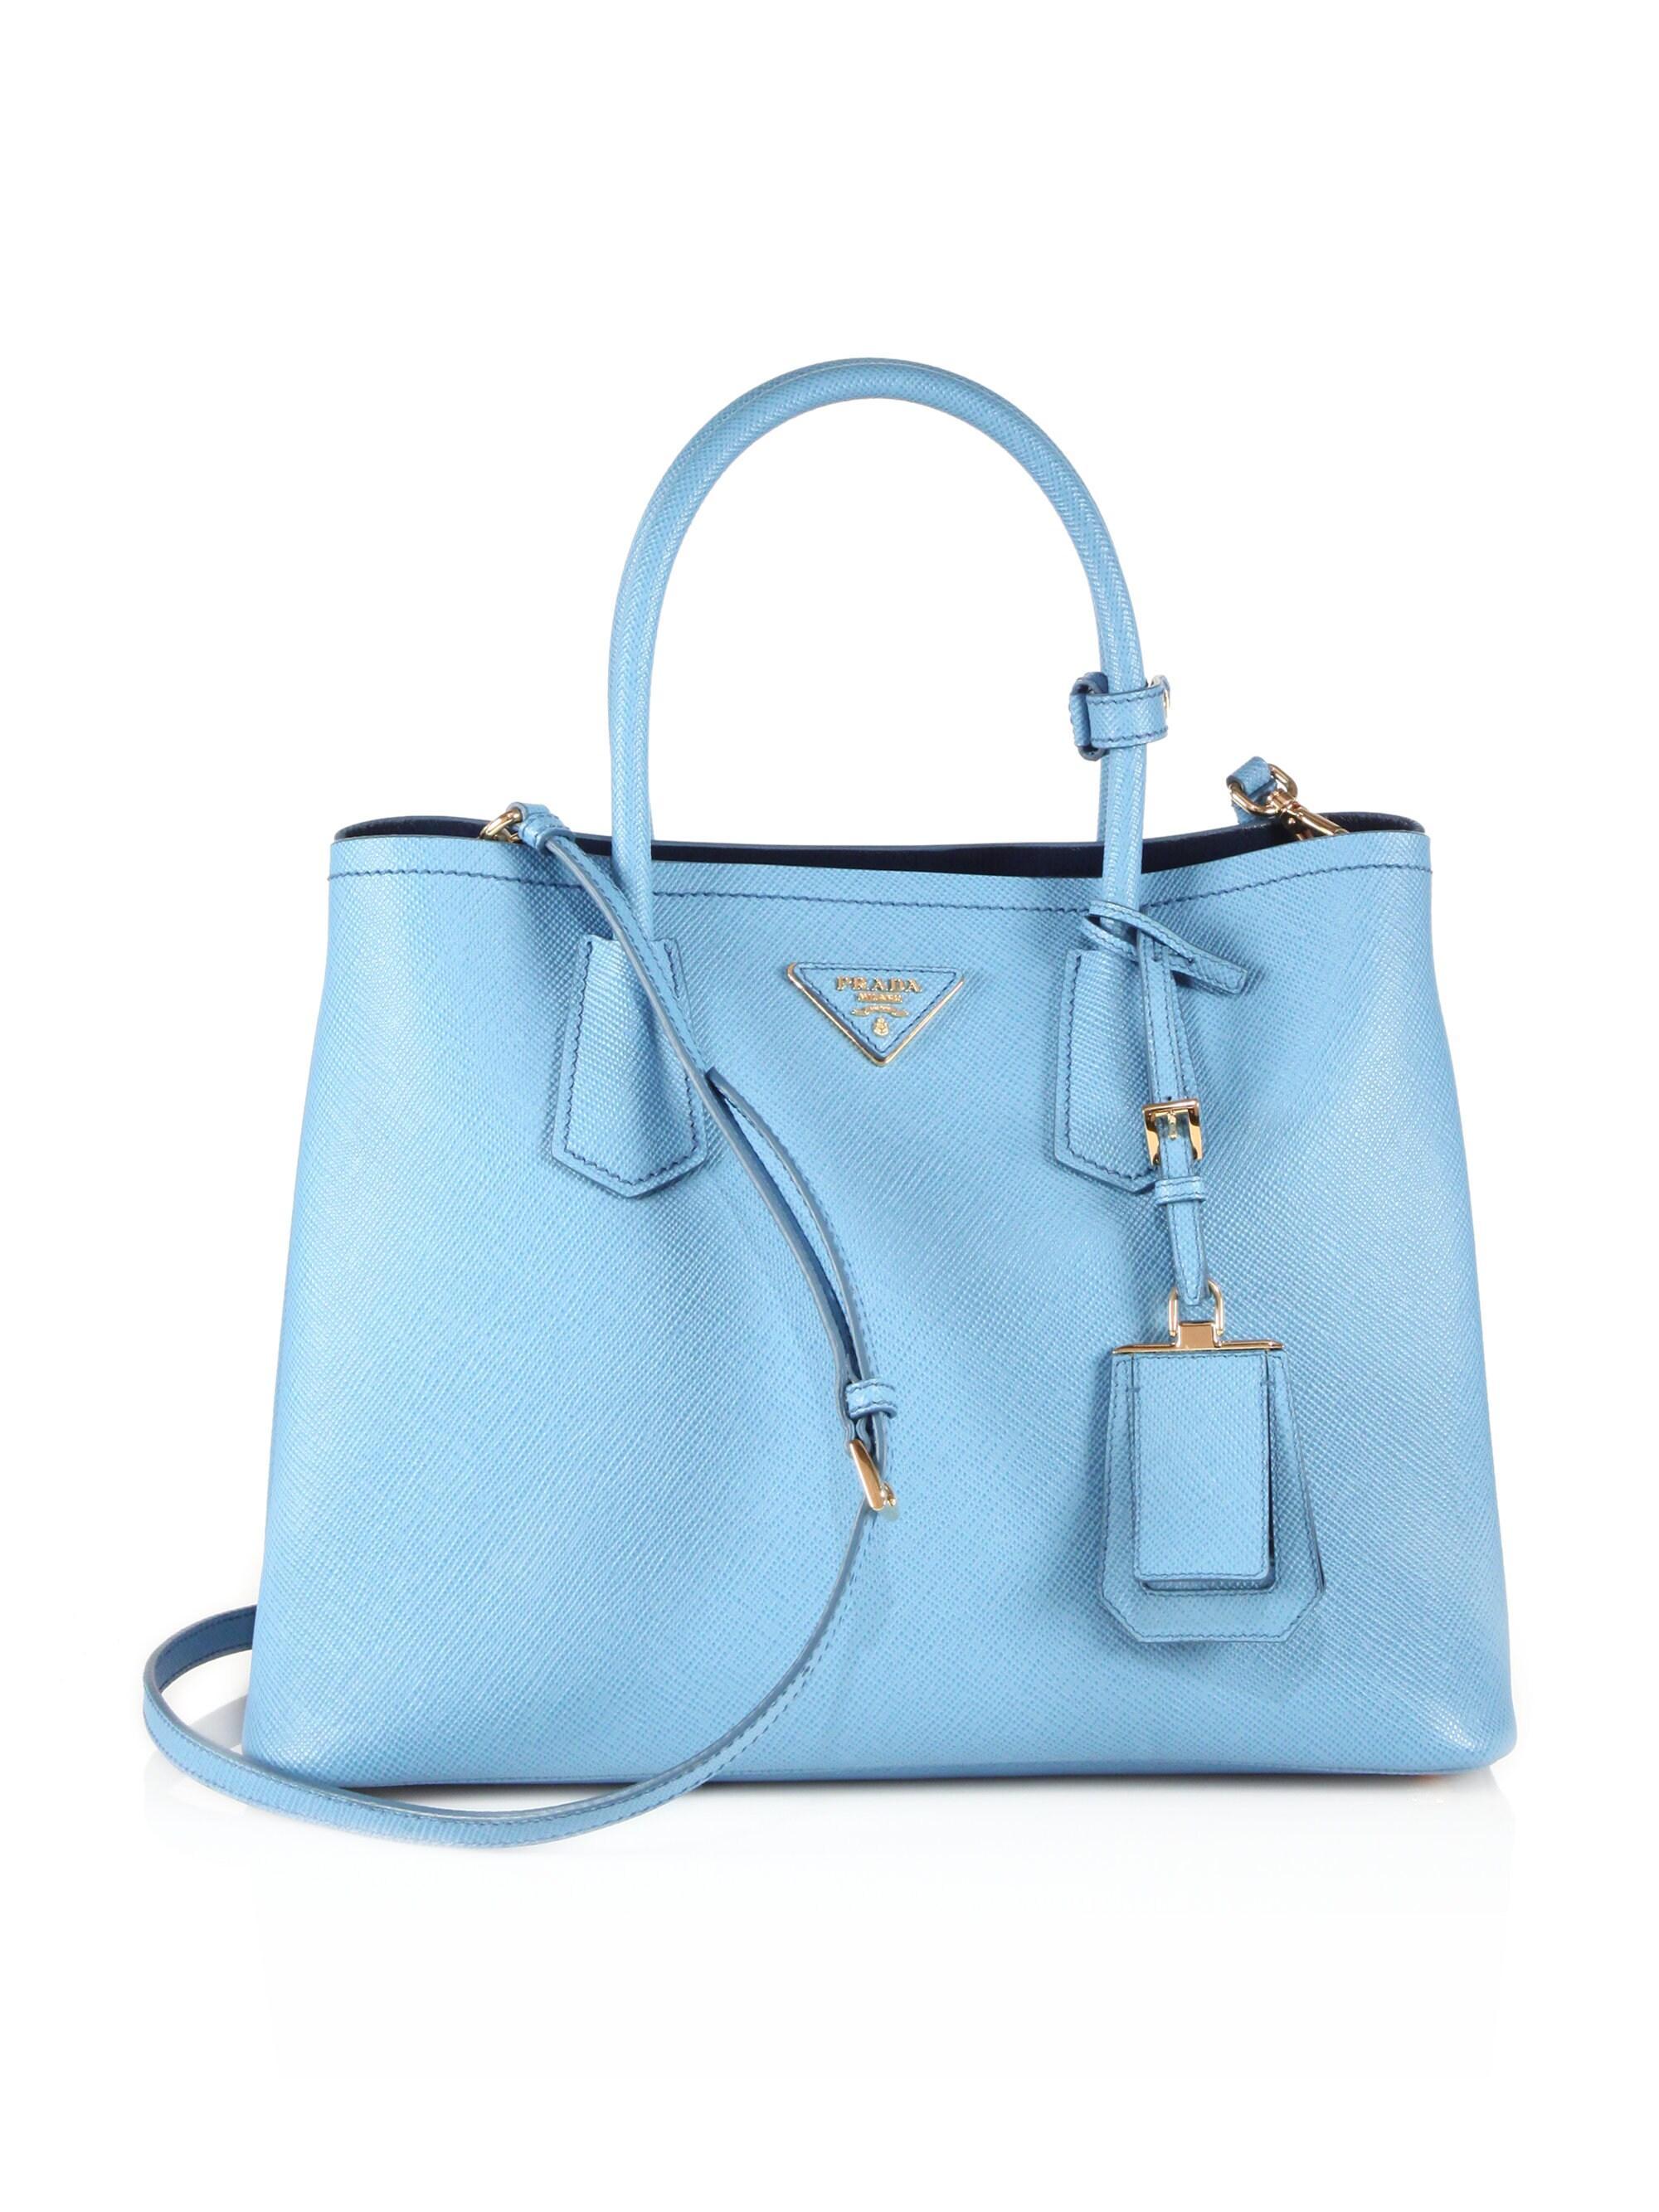 ada885cd202a4e Prada Saffiano Cuir Medium Double Bag in Blue - Lyst